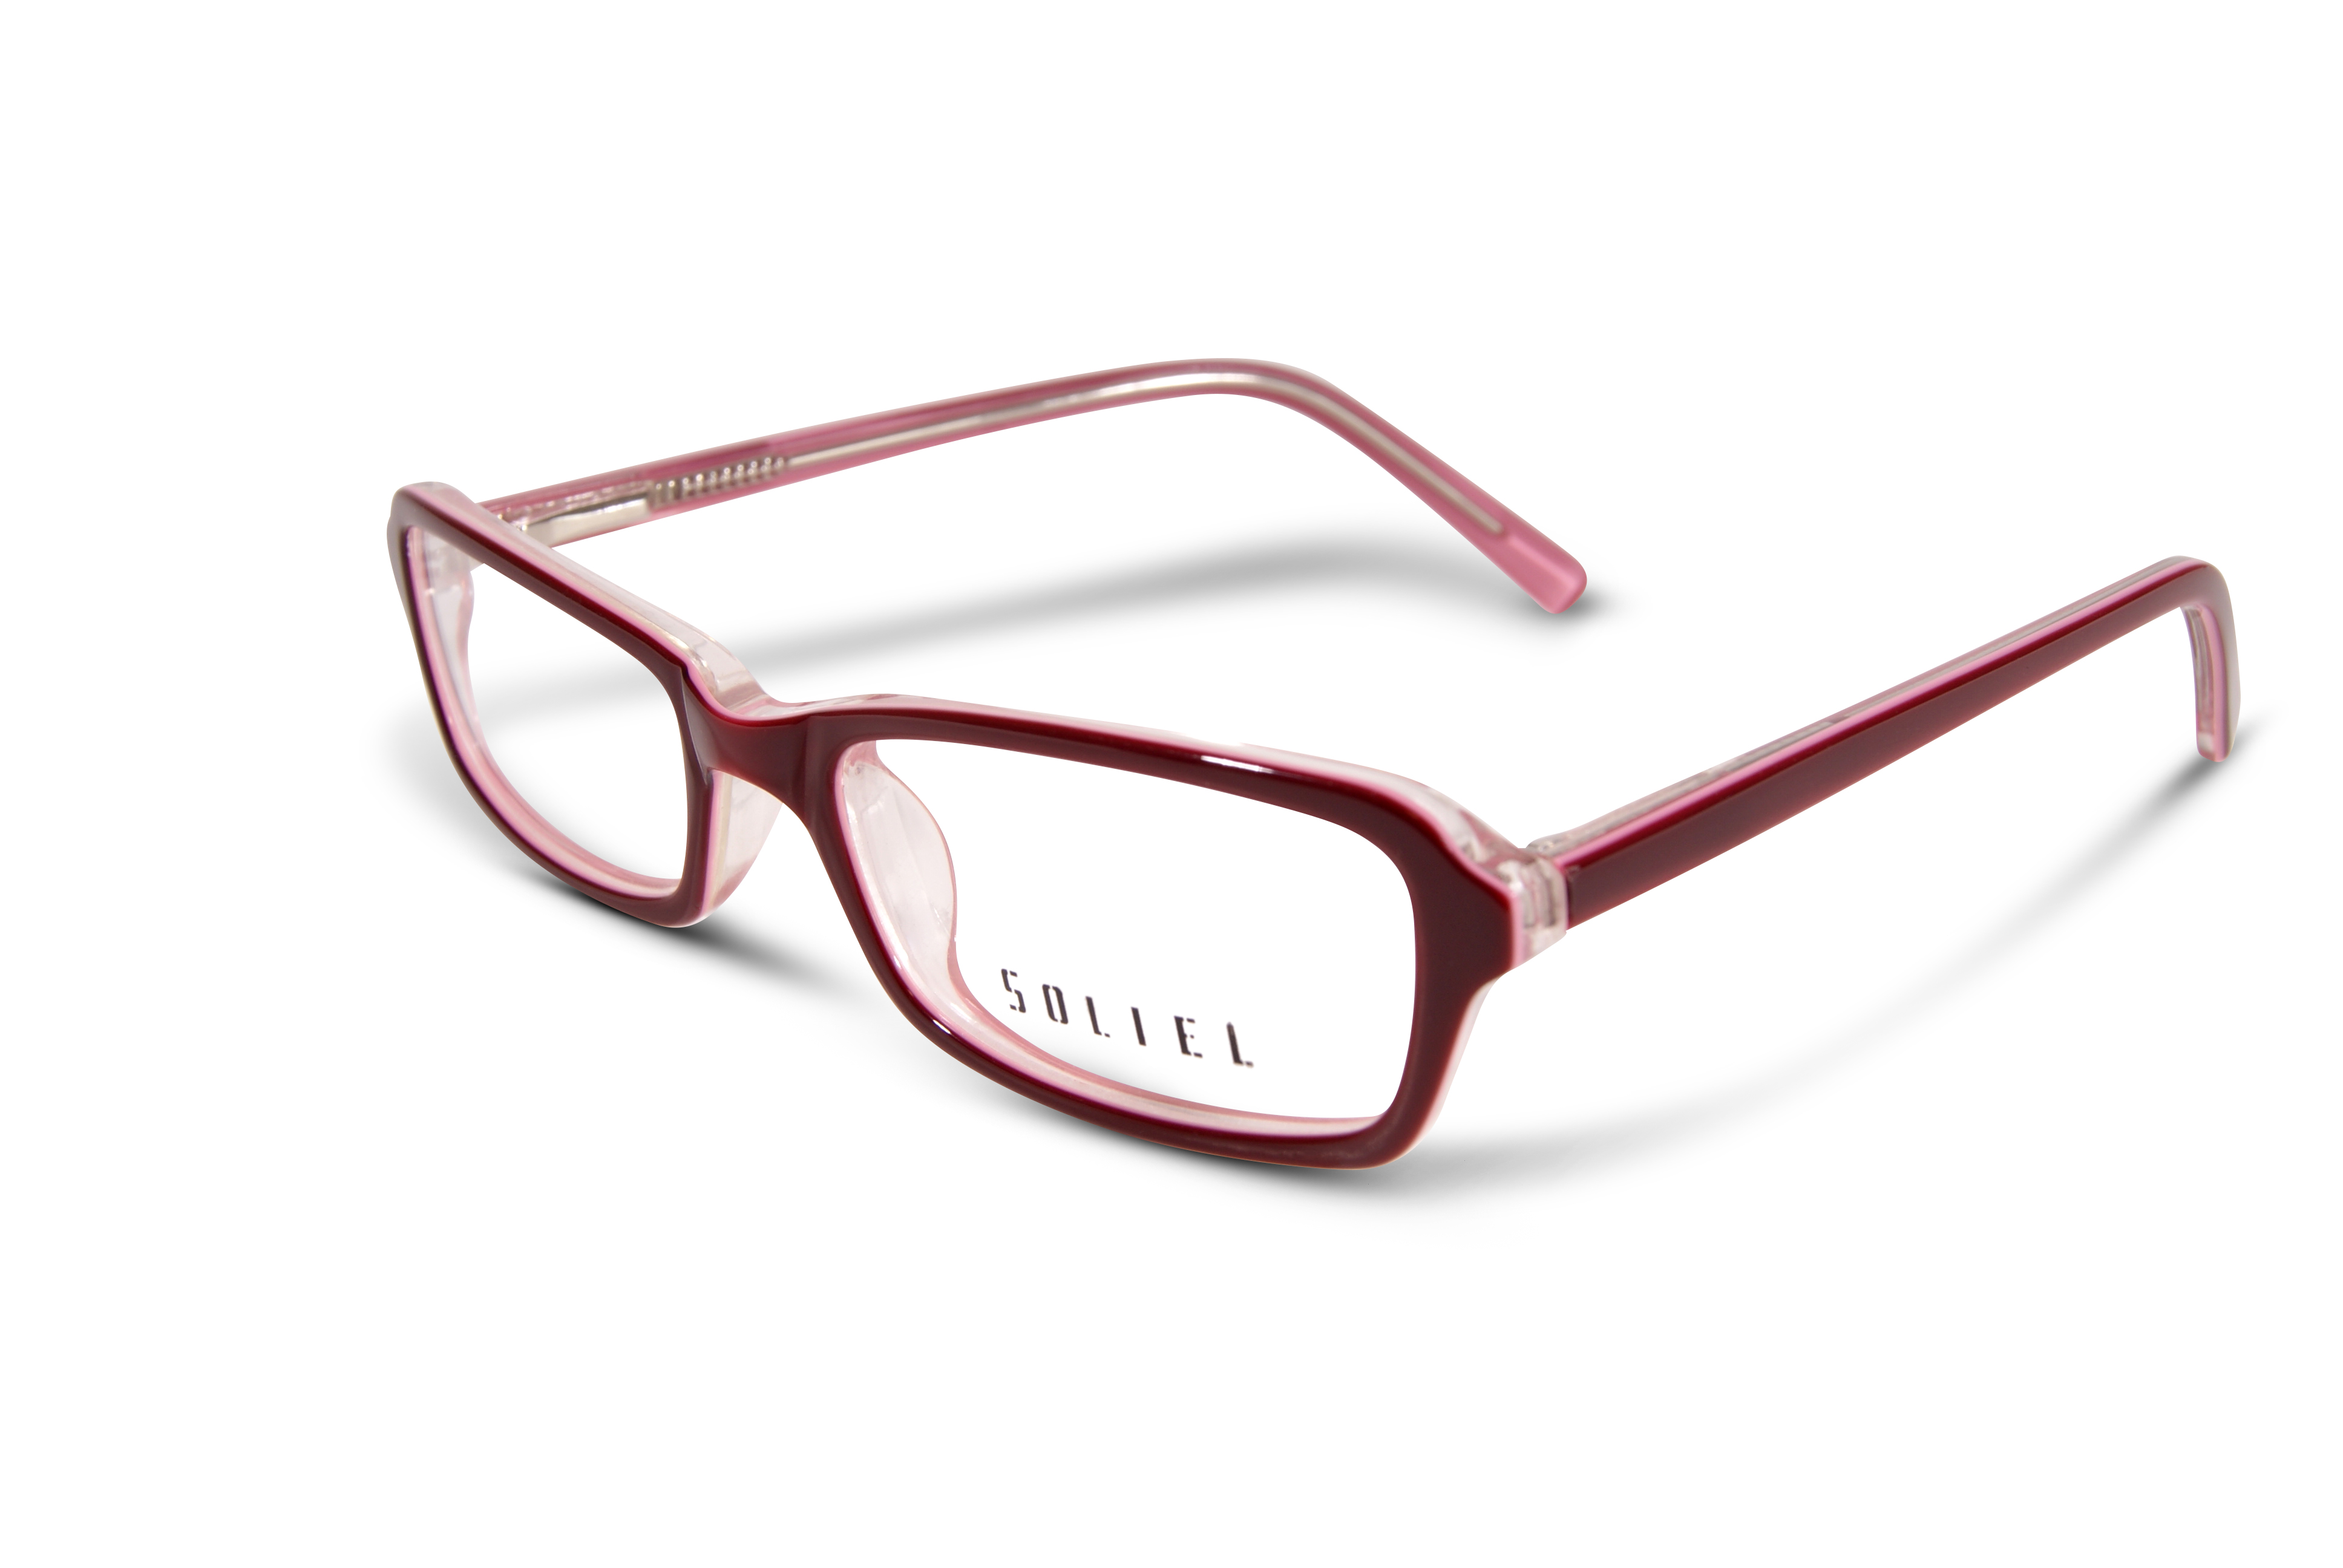 Rama de ochelari ieftina